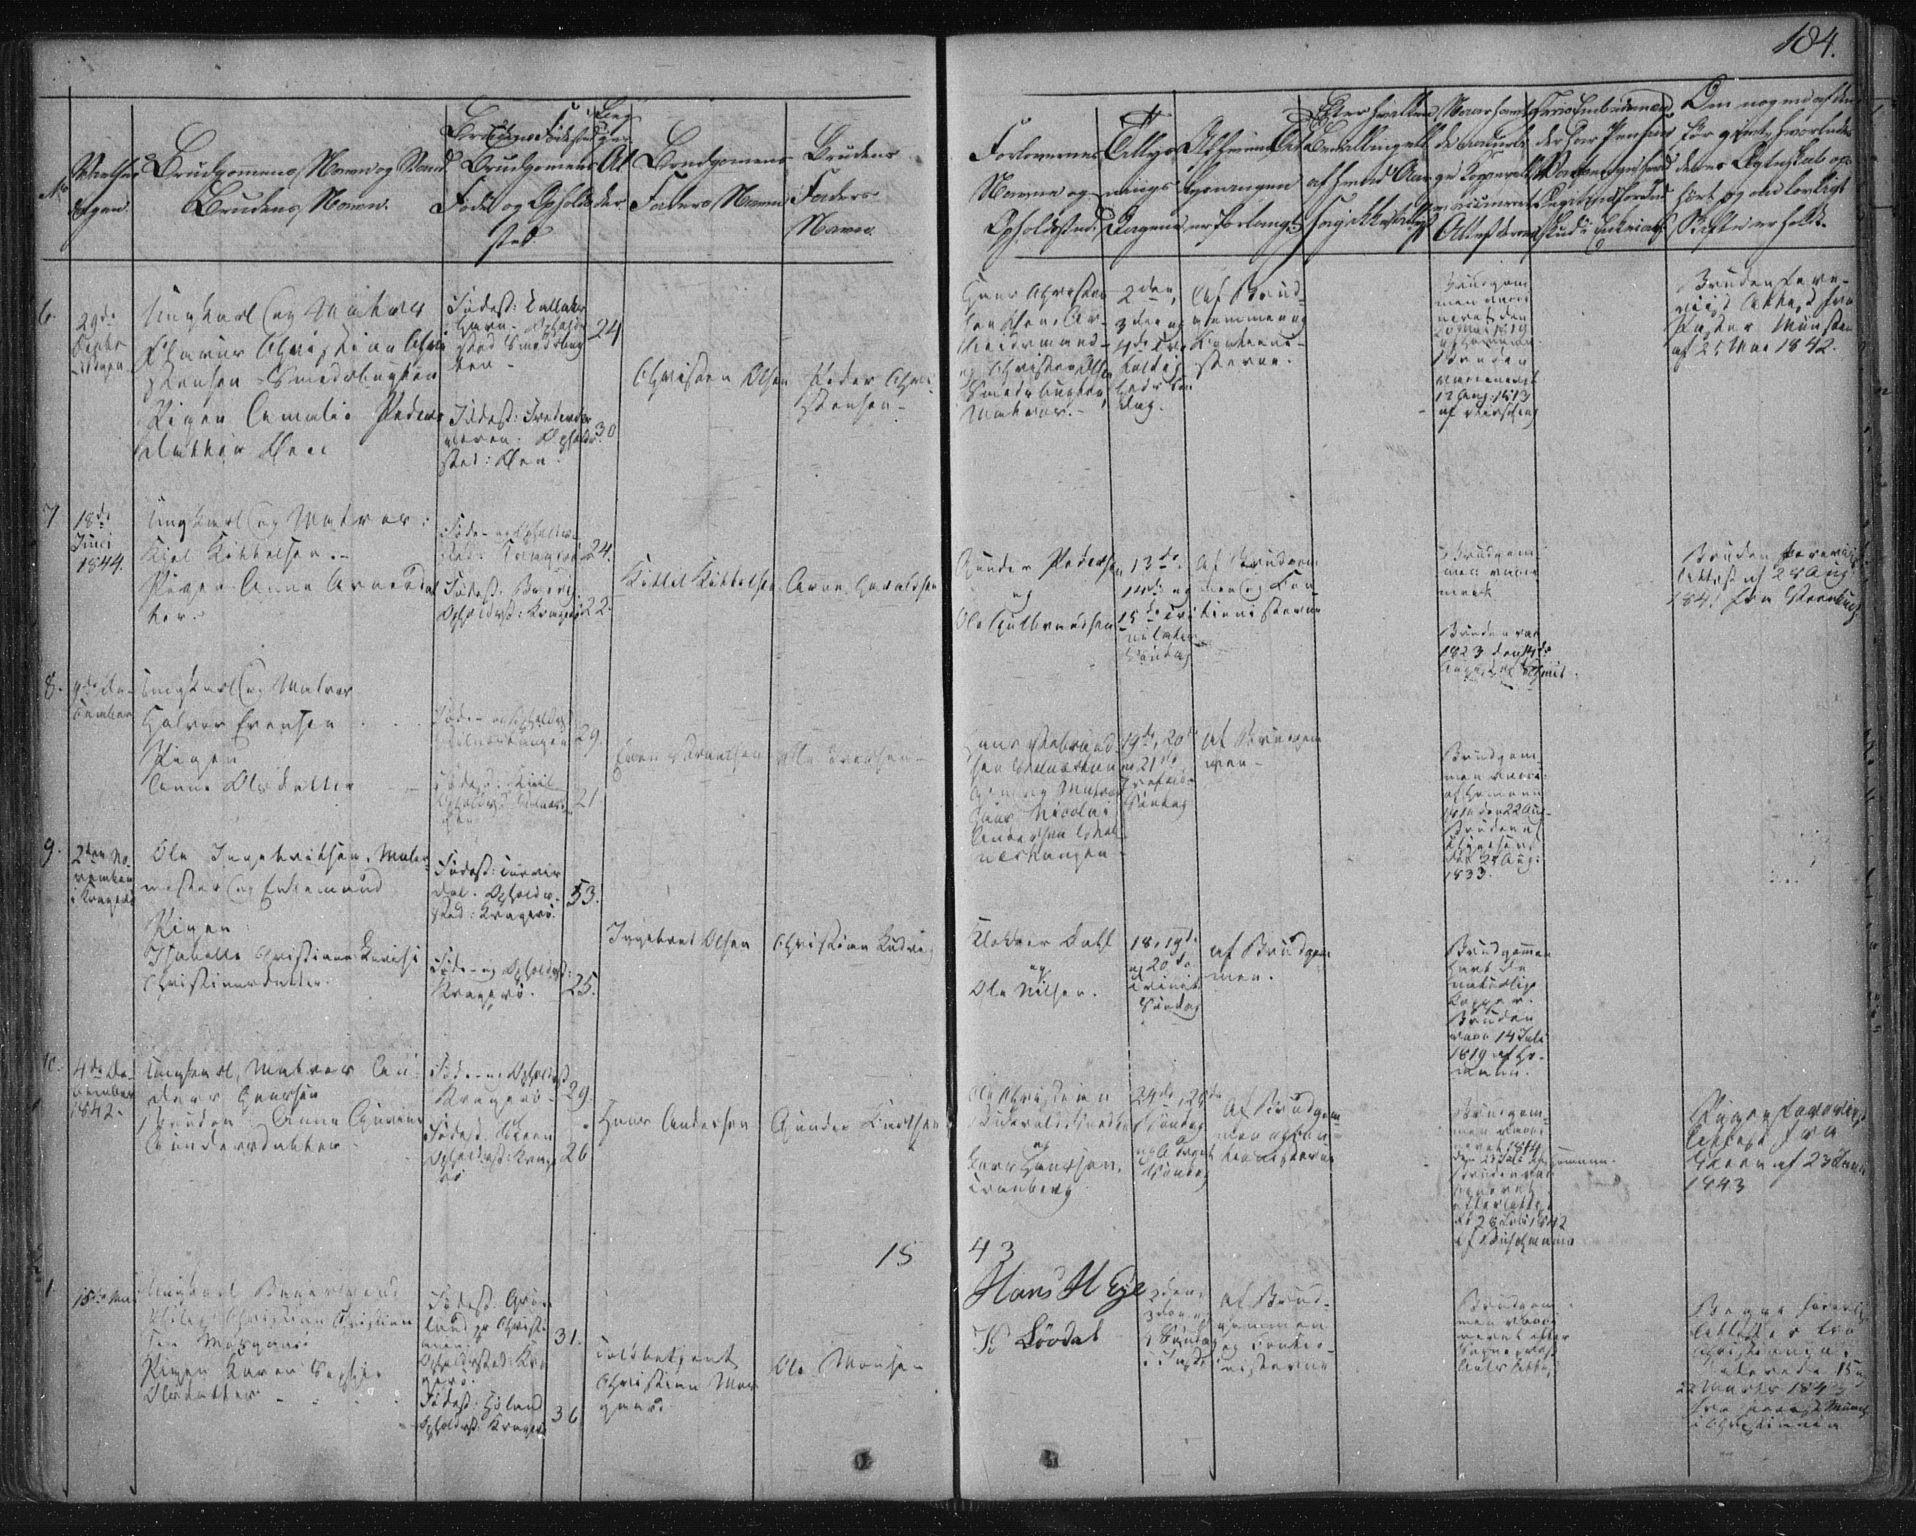 SAKO, Kragerø kirkebøker, F/Fa/L0005: Ministerialbok nr. 5, 1832-1847, s. 184